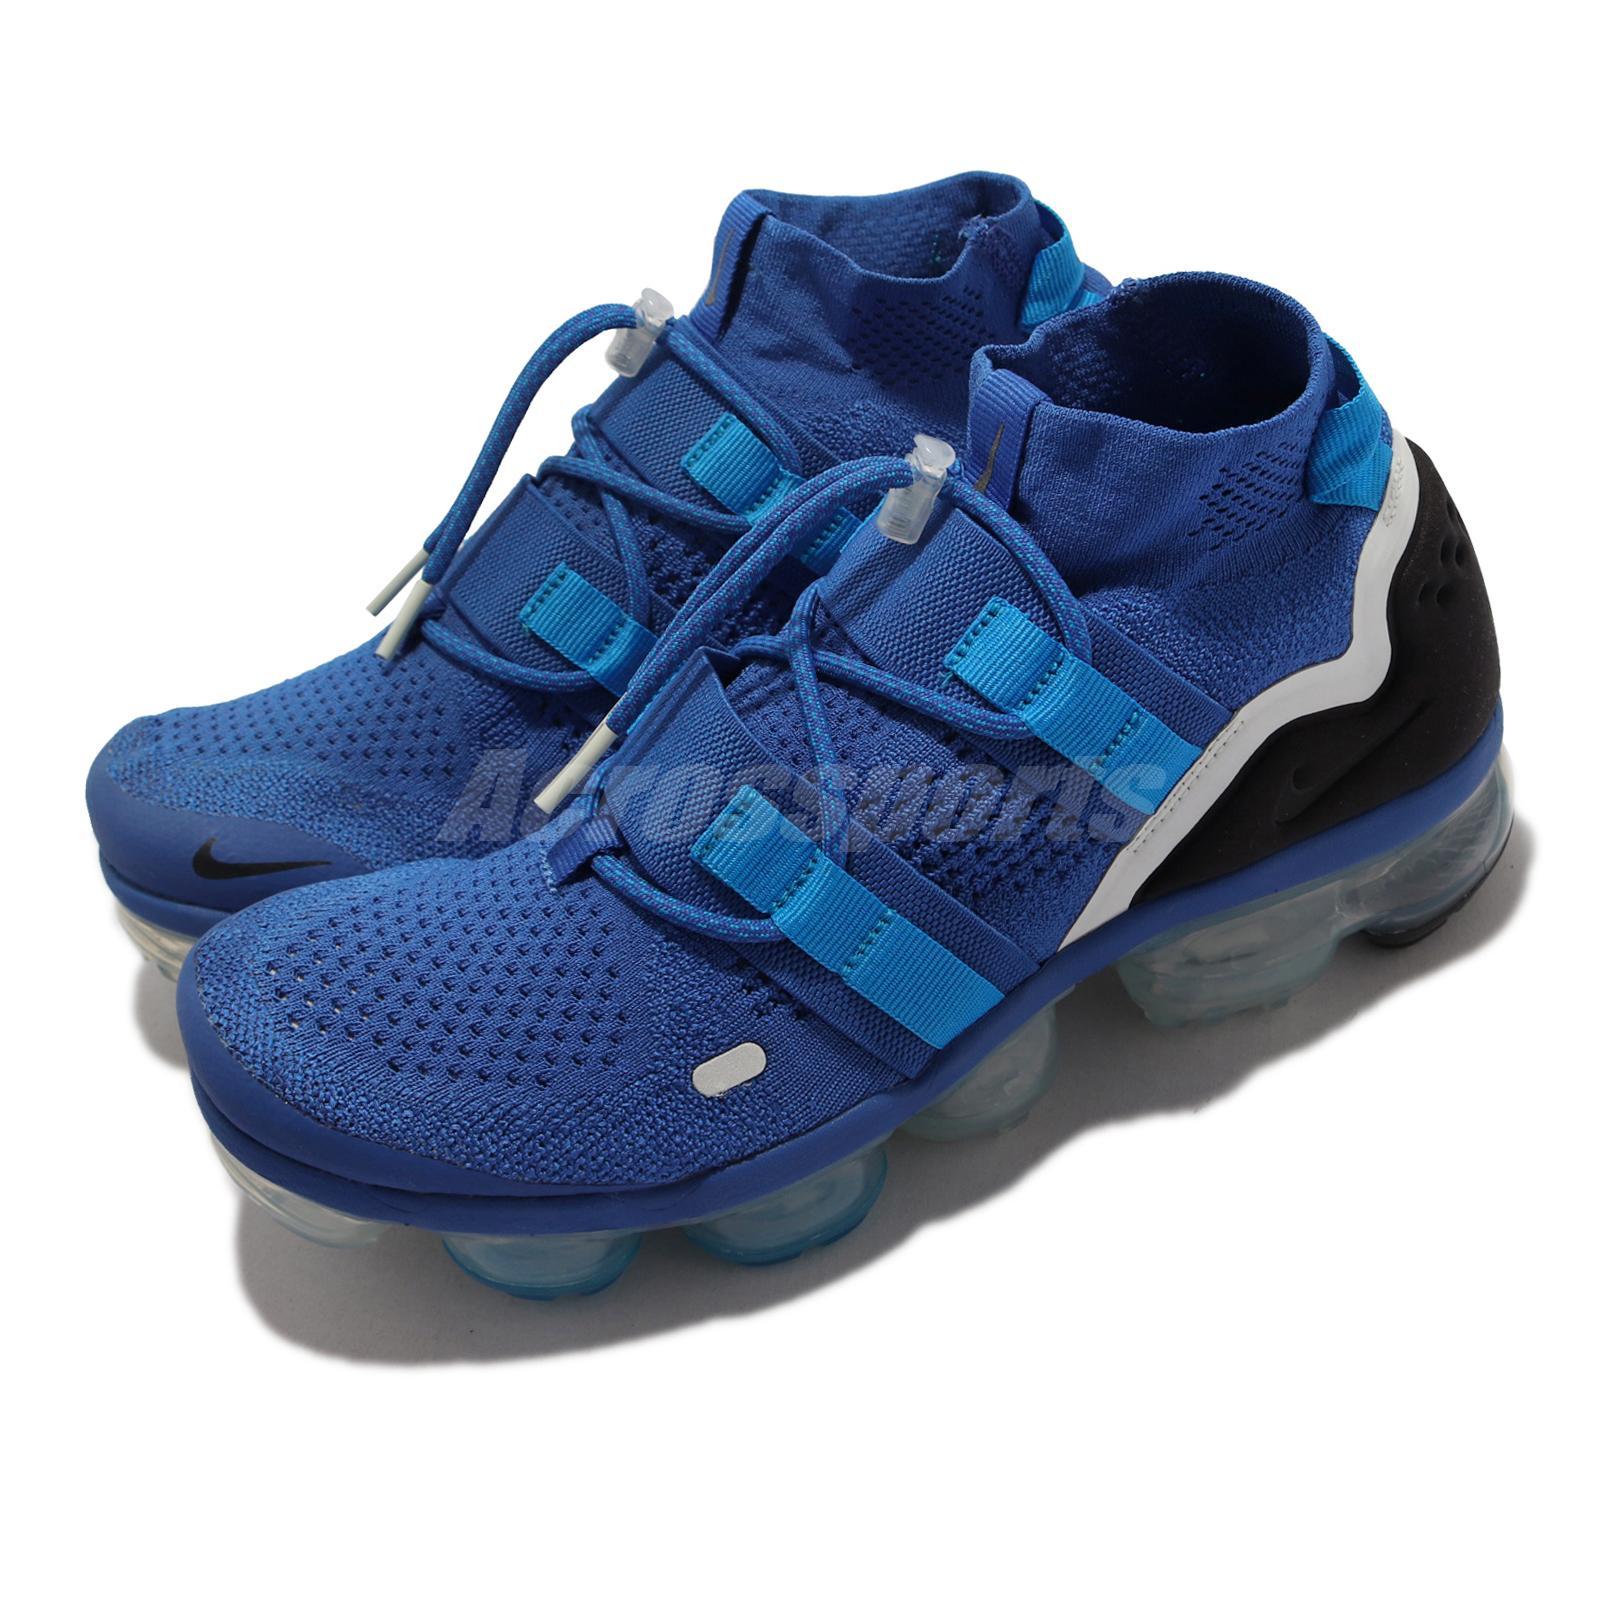 7b656c40f52d Details about Nike Air Vapormax FK Utility Flyknit Game Royal Black Blue  Men Shoes AH6834-400